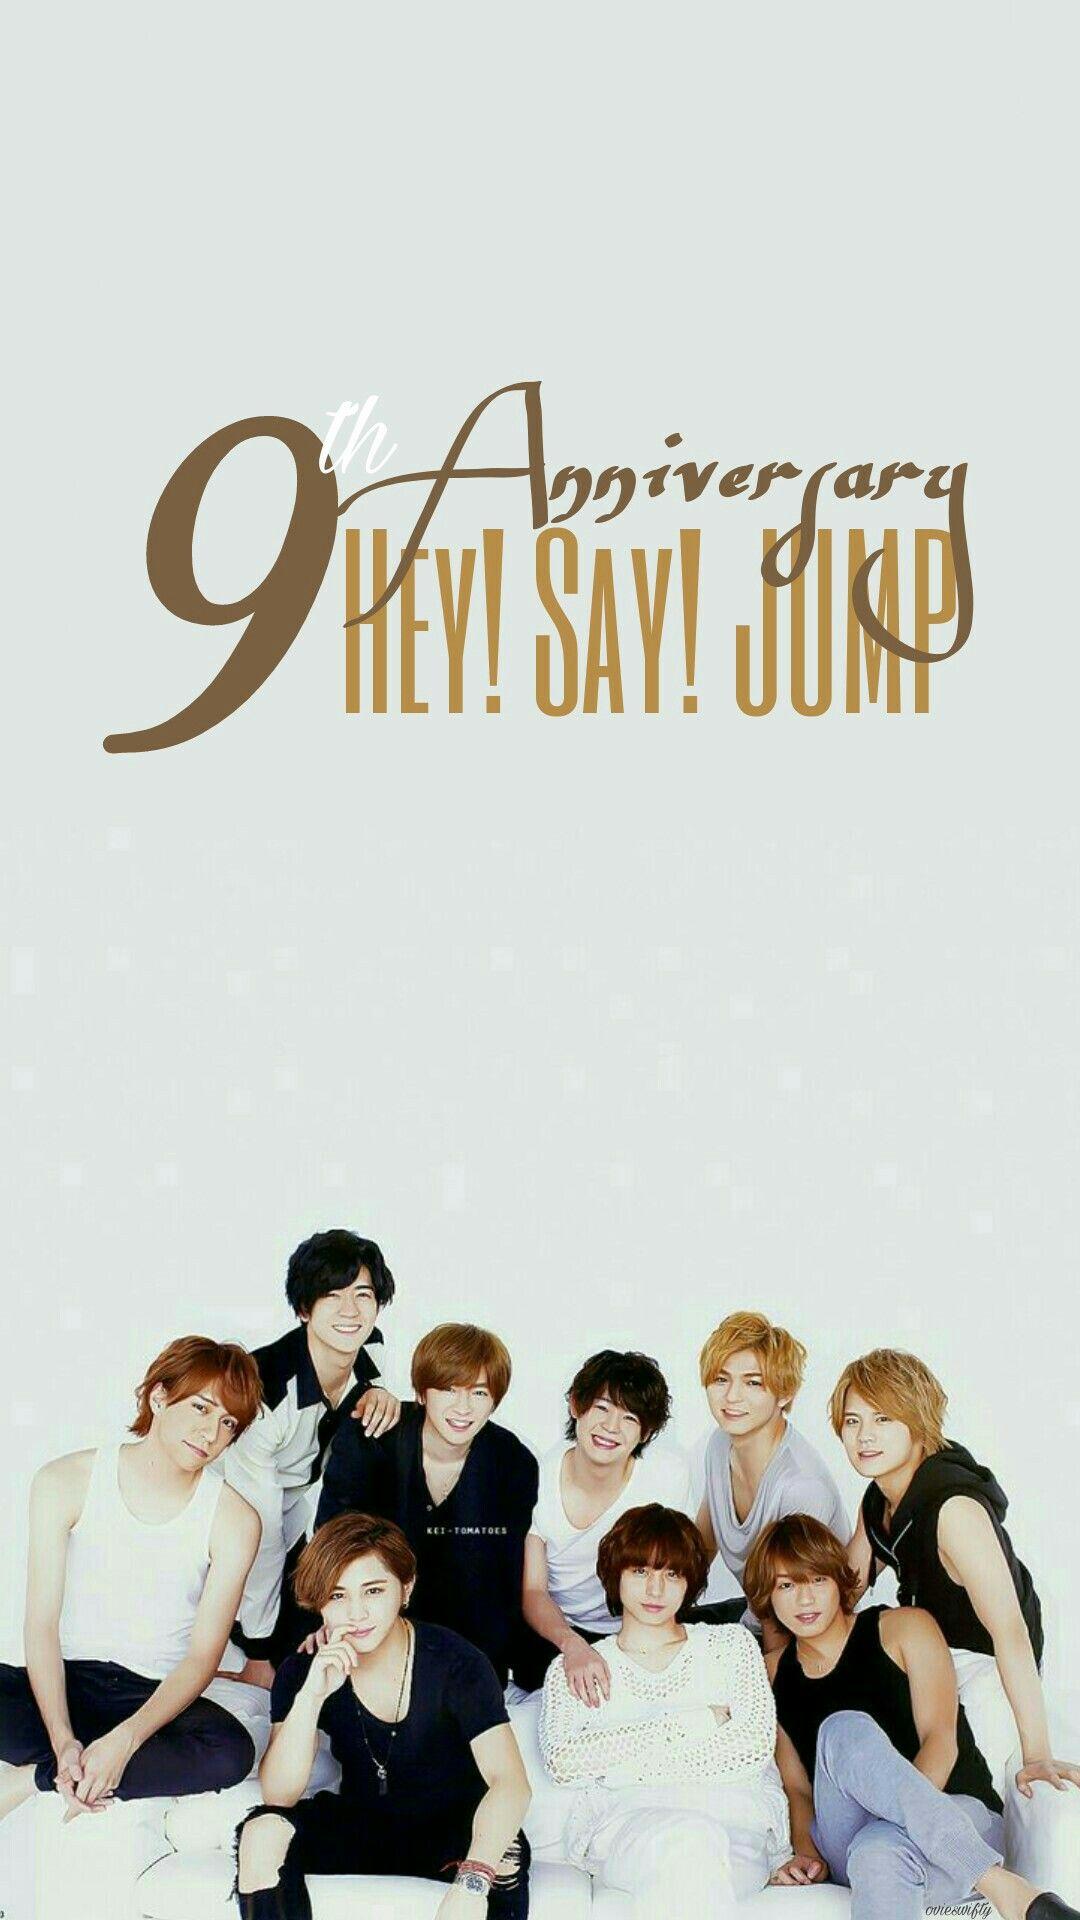 Happy 9th Years Anniversary Hey Say Jump Heysayjump Heysaybest Heysay7 Takakiyuya Yuyatakaki Ariokadaiki Daikiarioka Yabuko Hey Say Jump 壁紙 ゆー り 壁紙